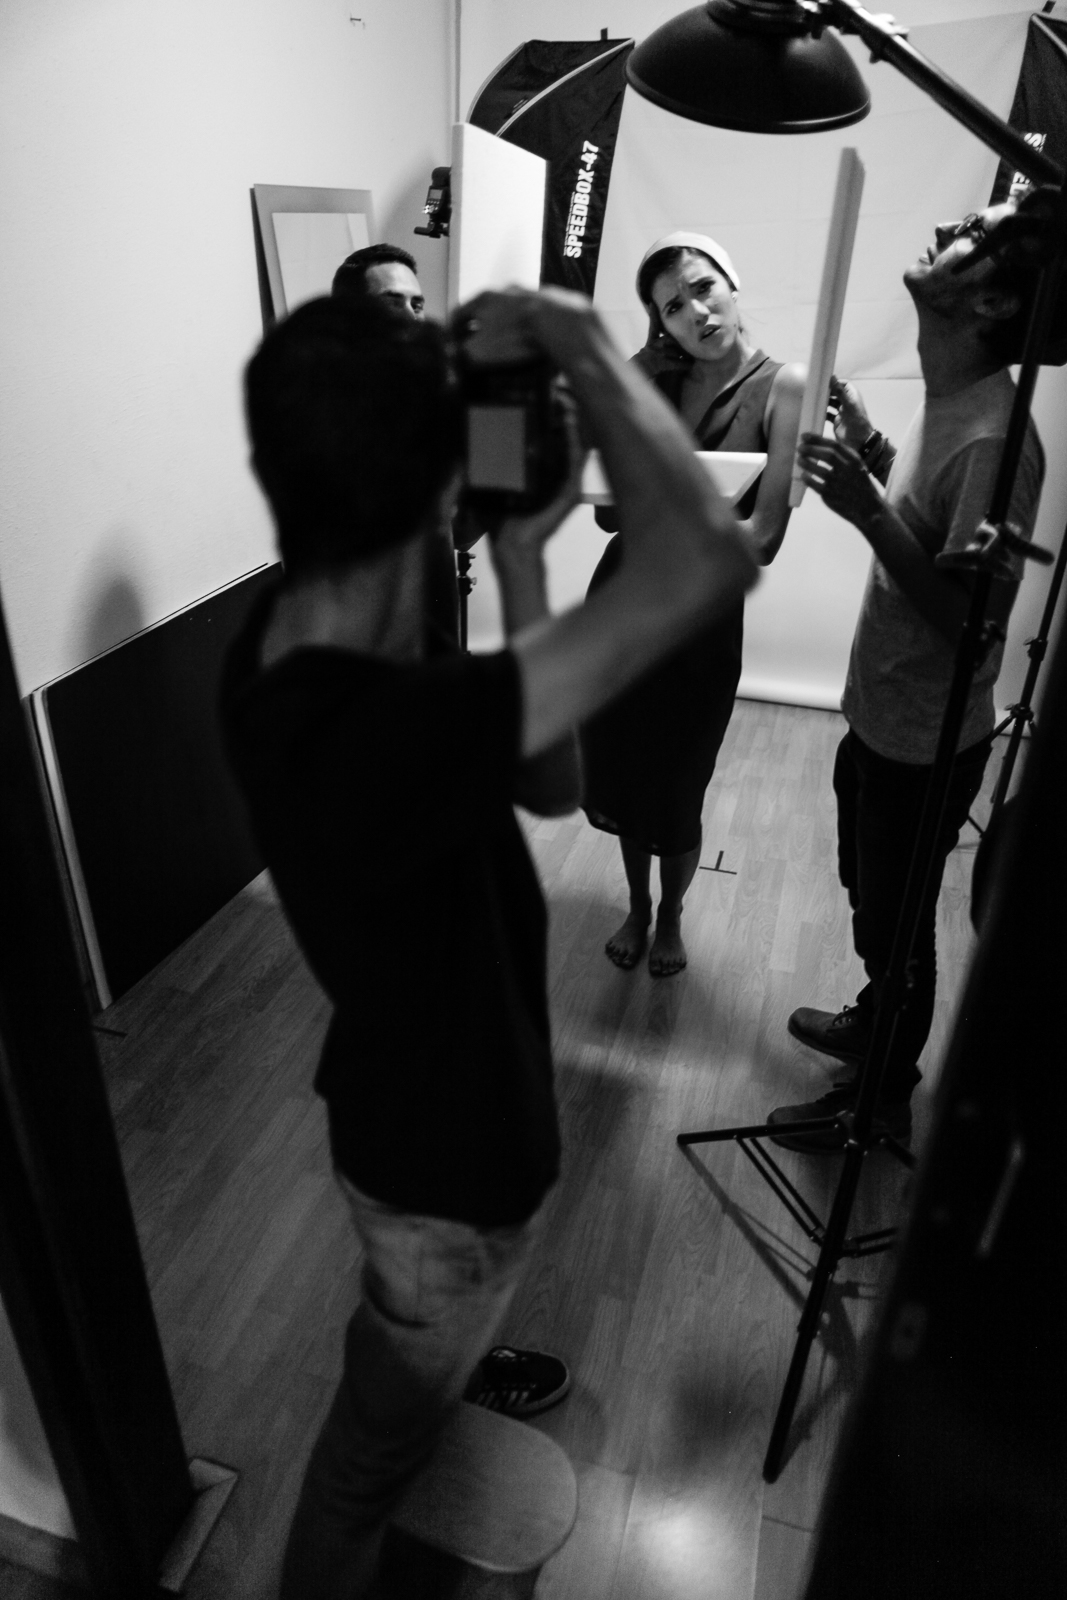 PacoNavarro en su sesión con Ana. PacoNavarro shooting Ana